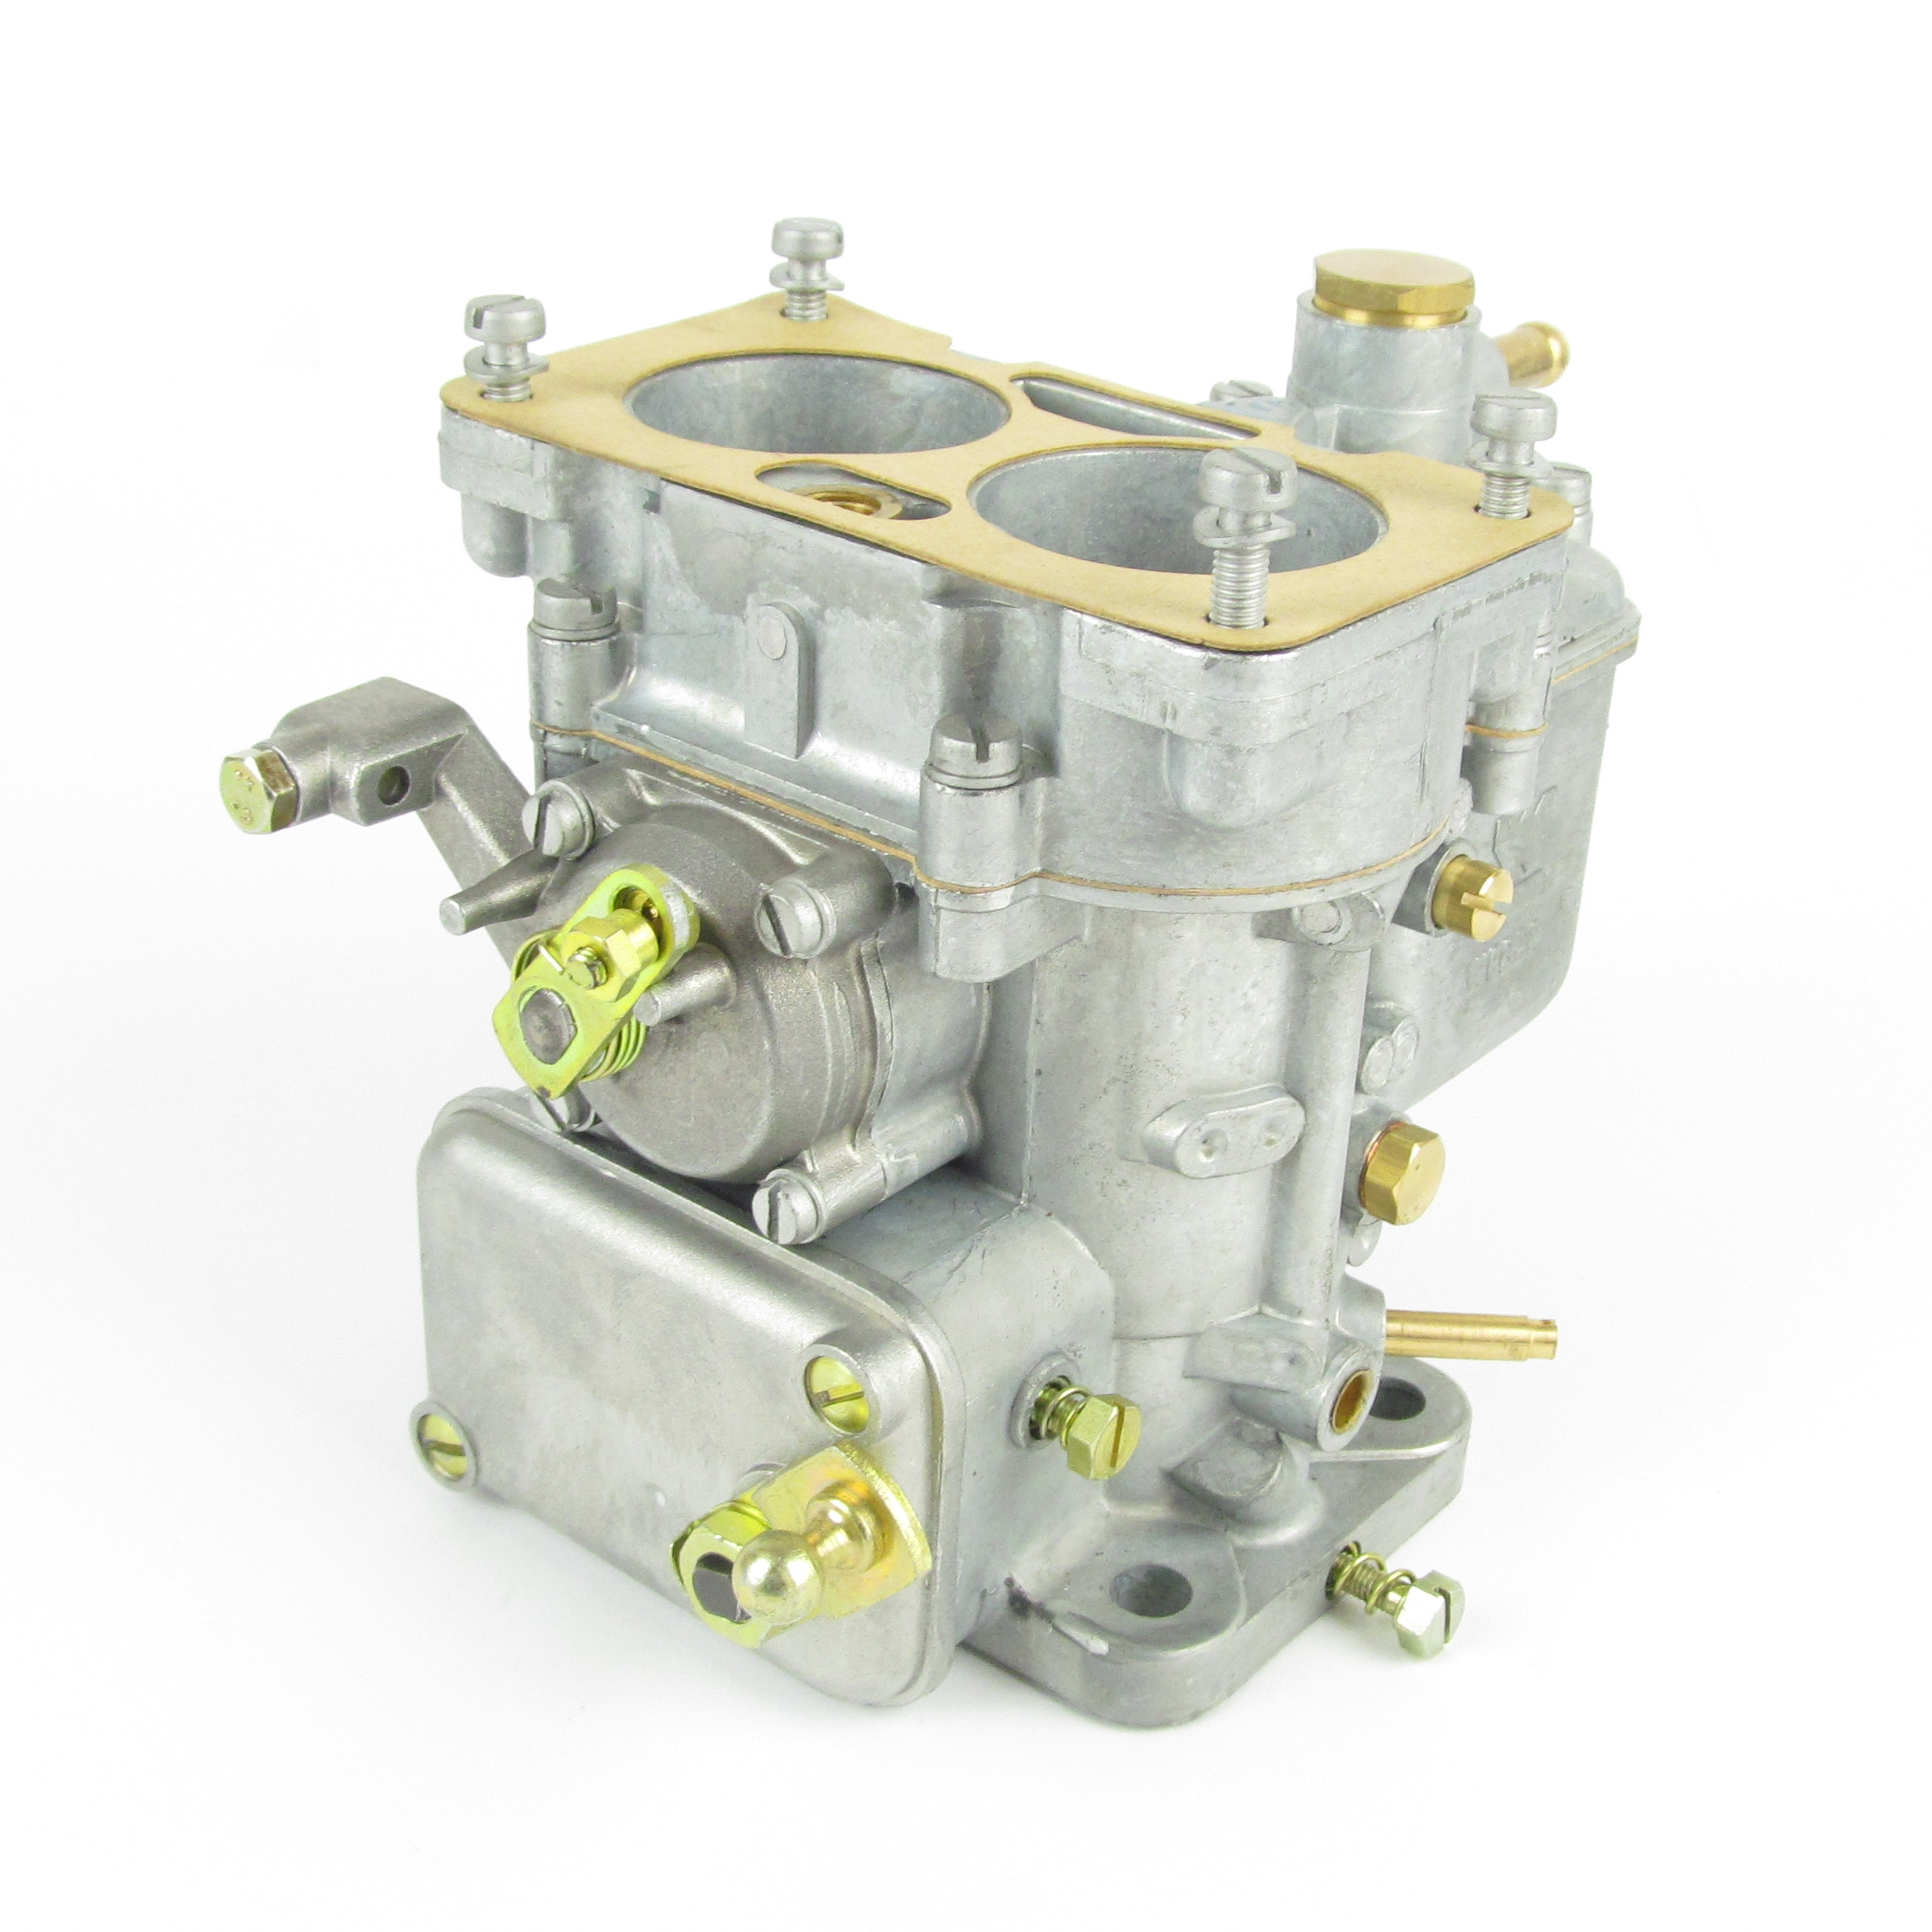 18910 139 Weber DCD 36/36 carburettor